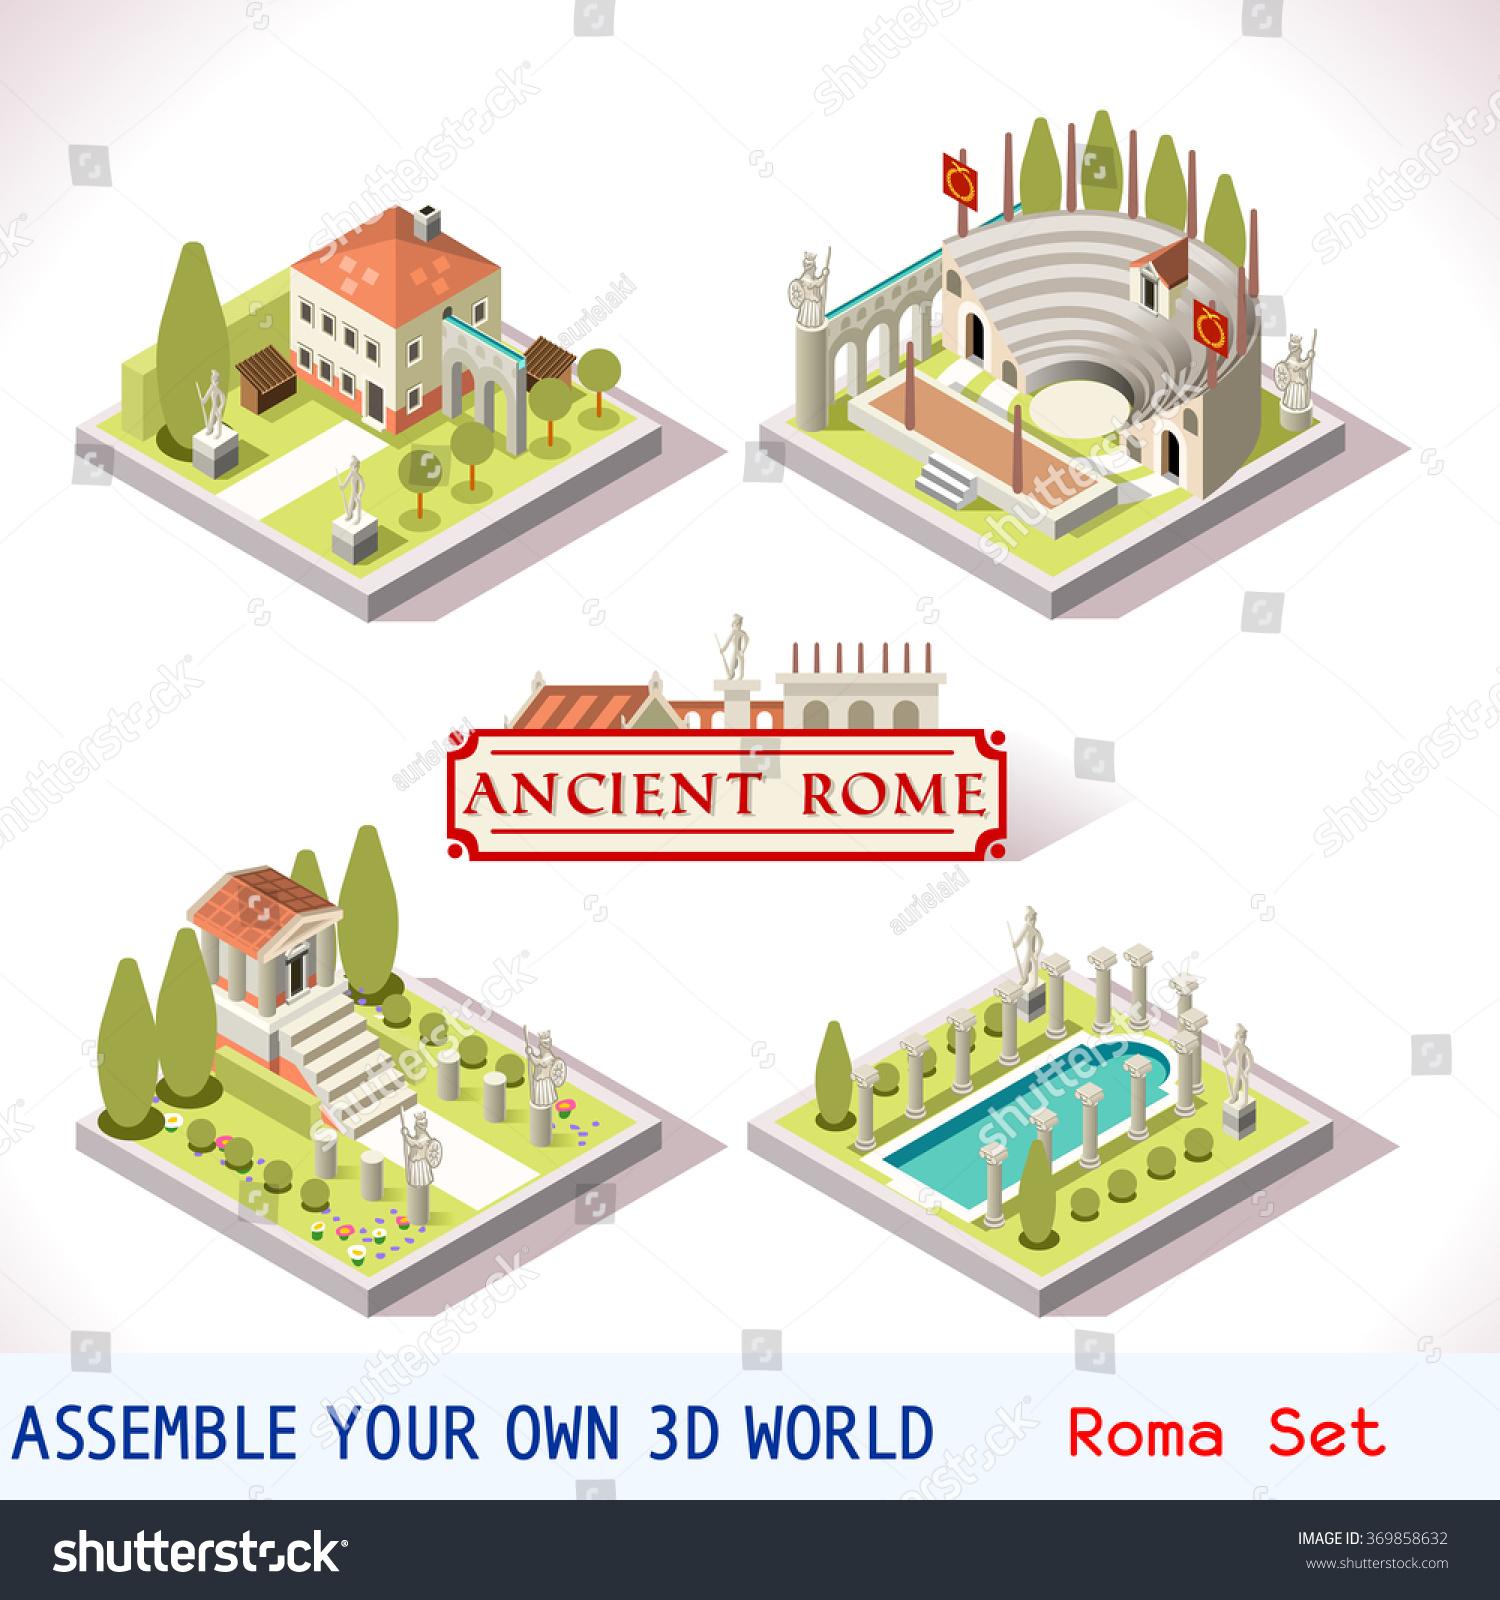 Caesar 3 Map Editor Related Keywords & Suggestions - Caesar 3 Map